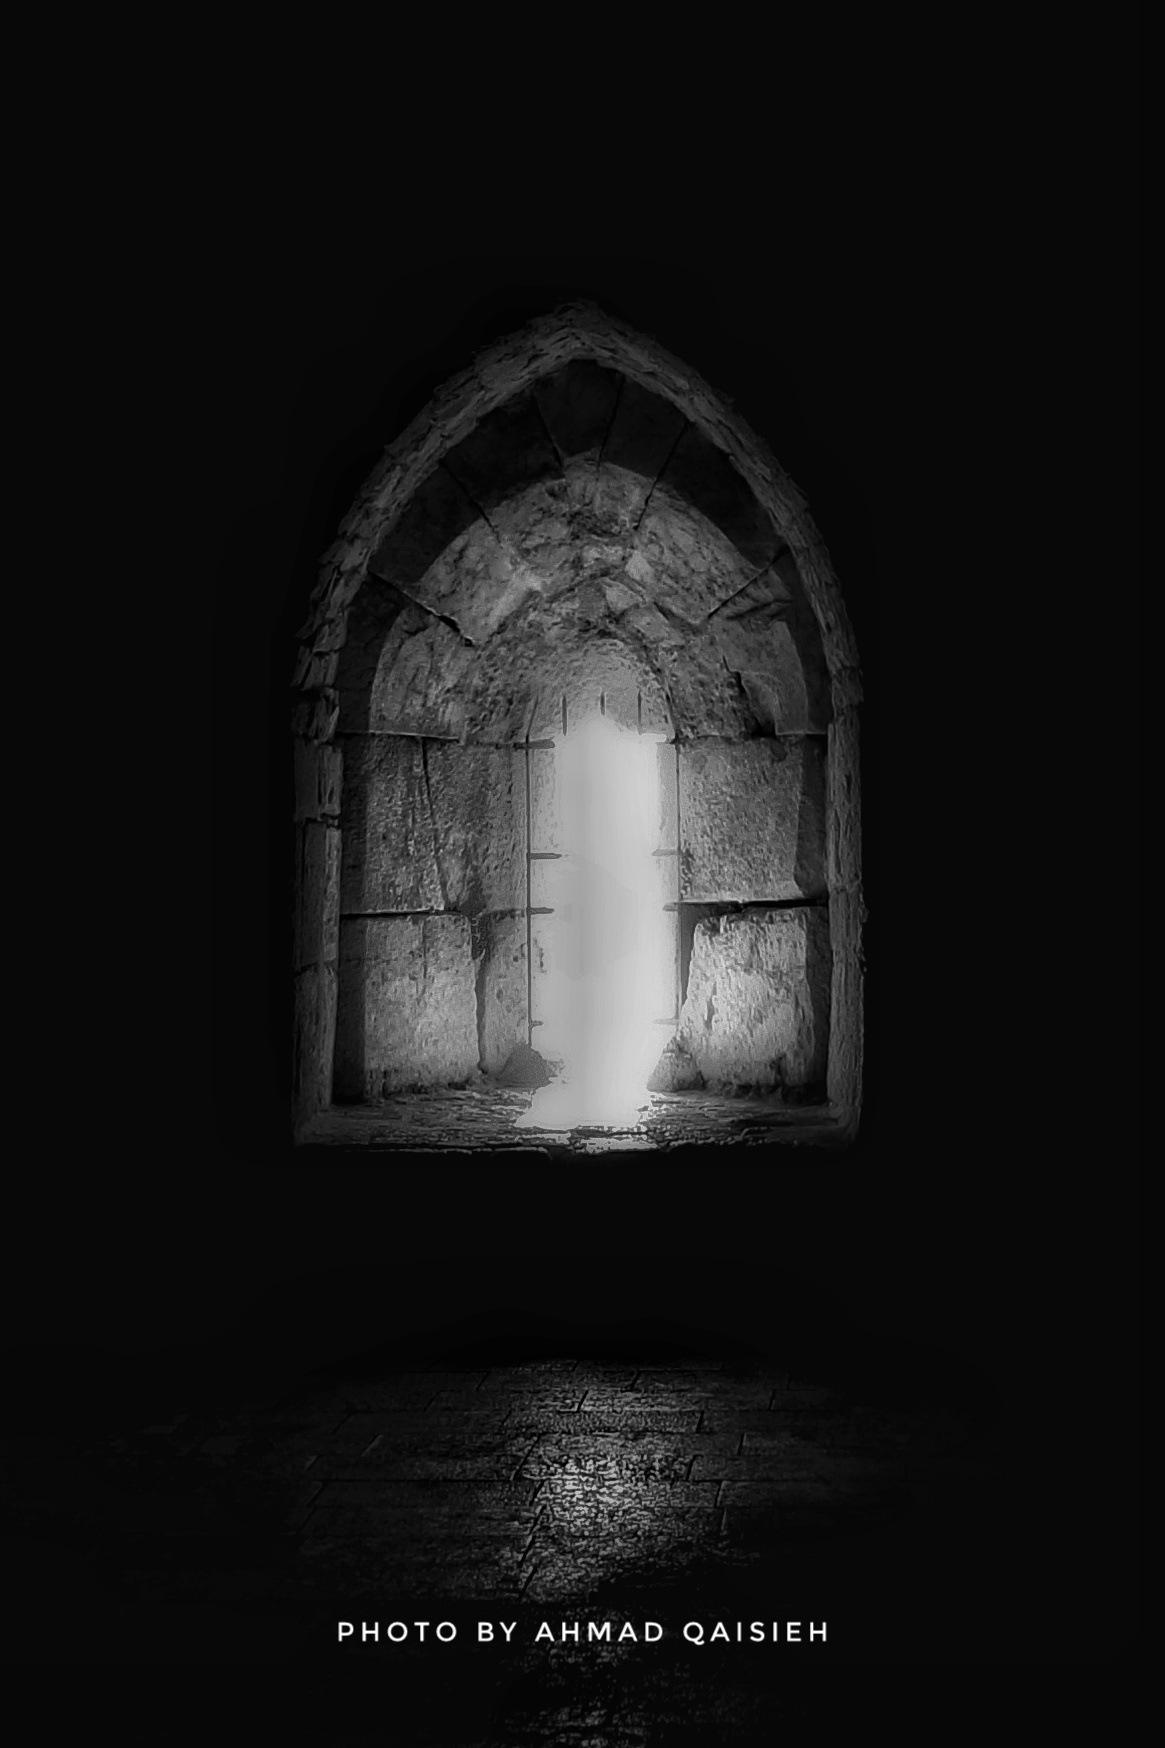 Untitled by Ahmad Qaisieh